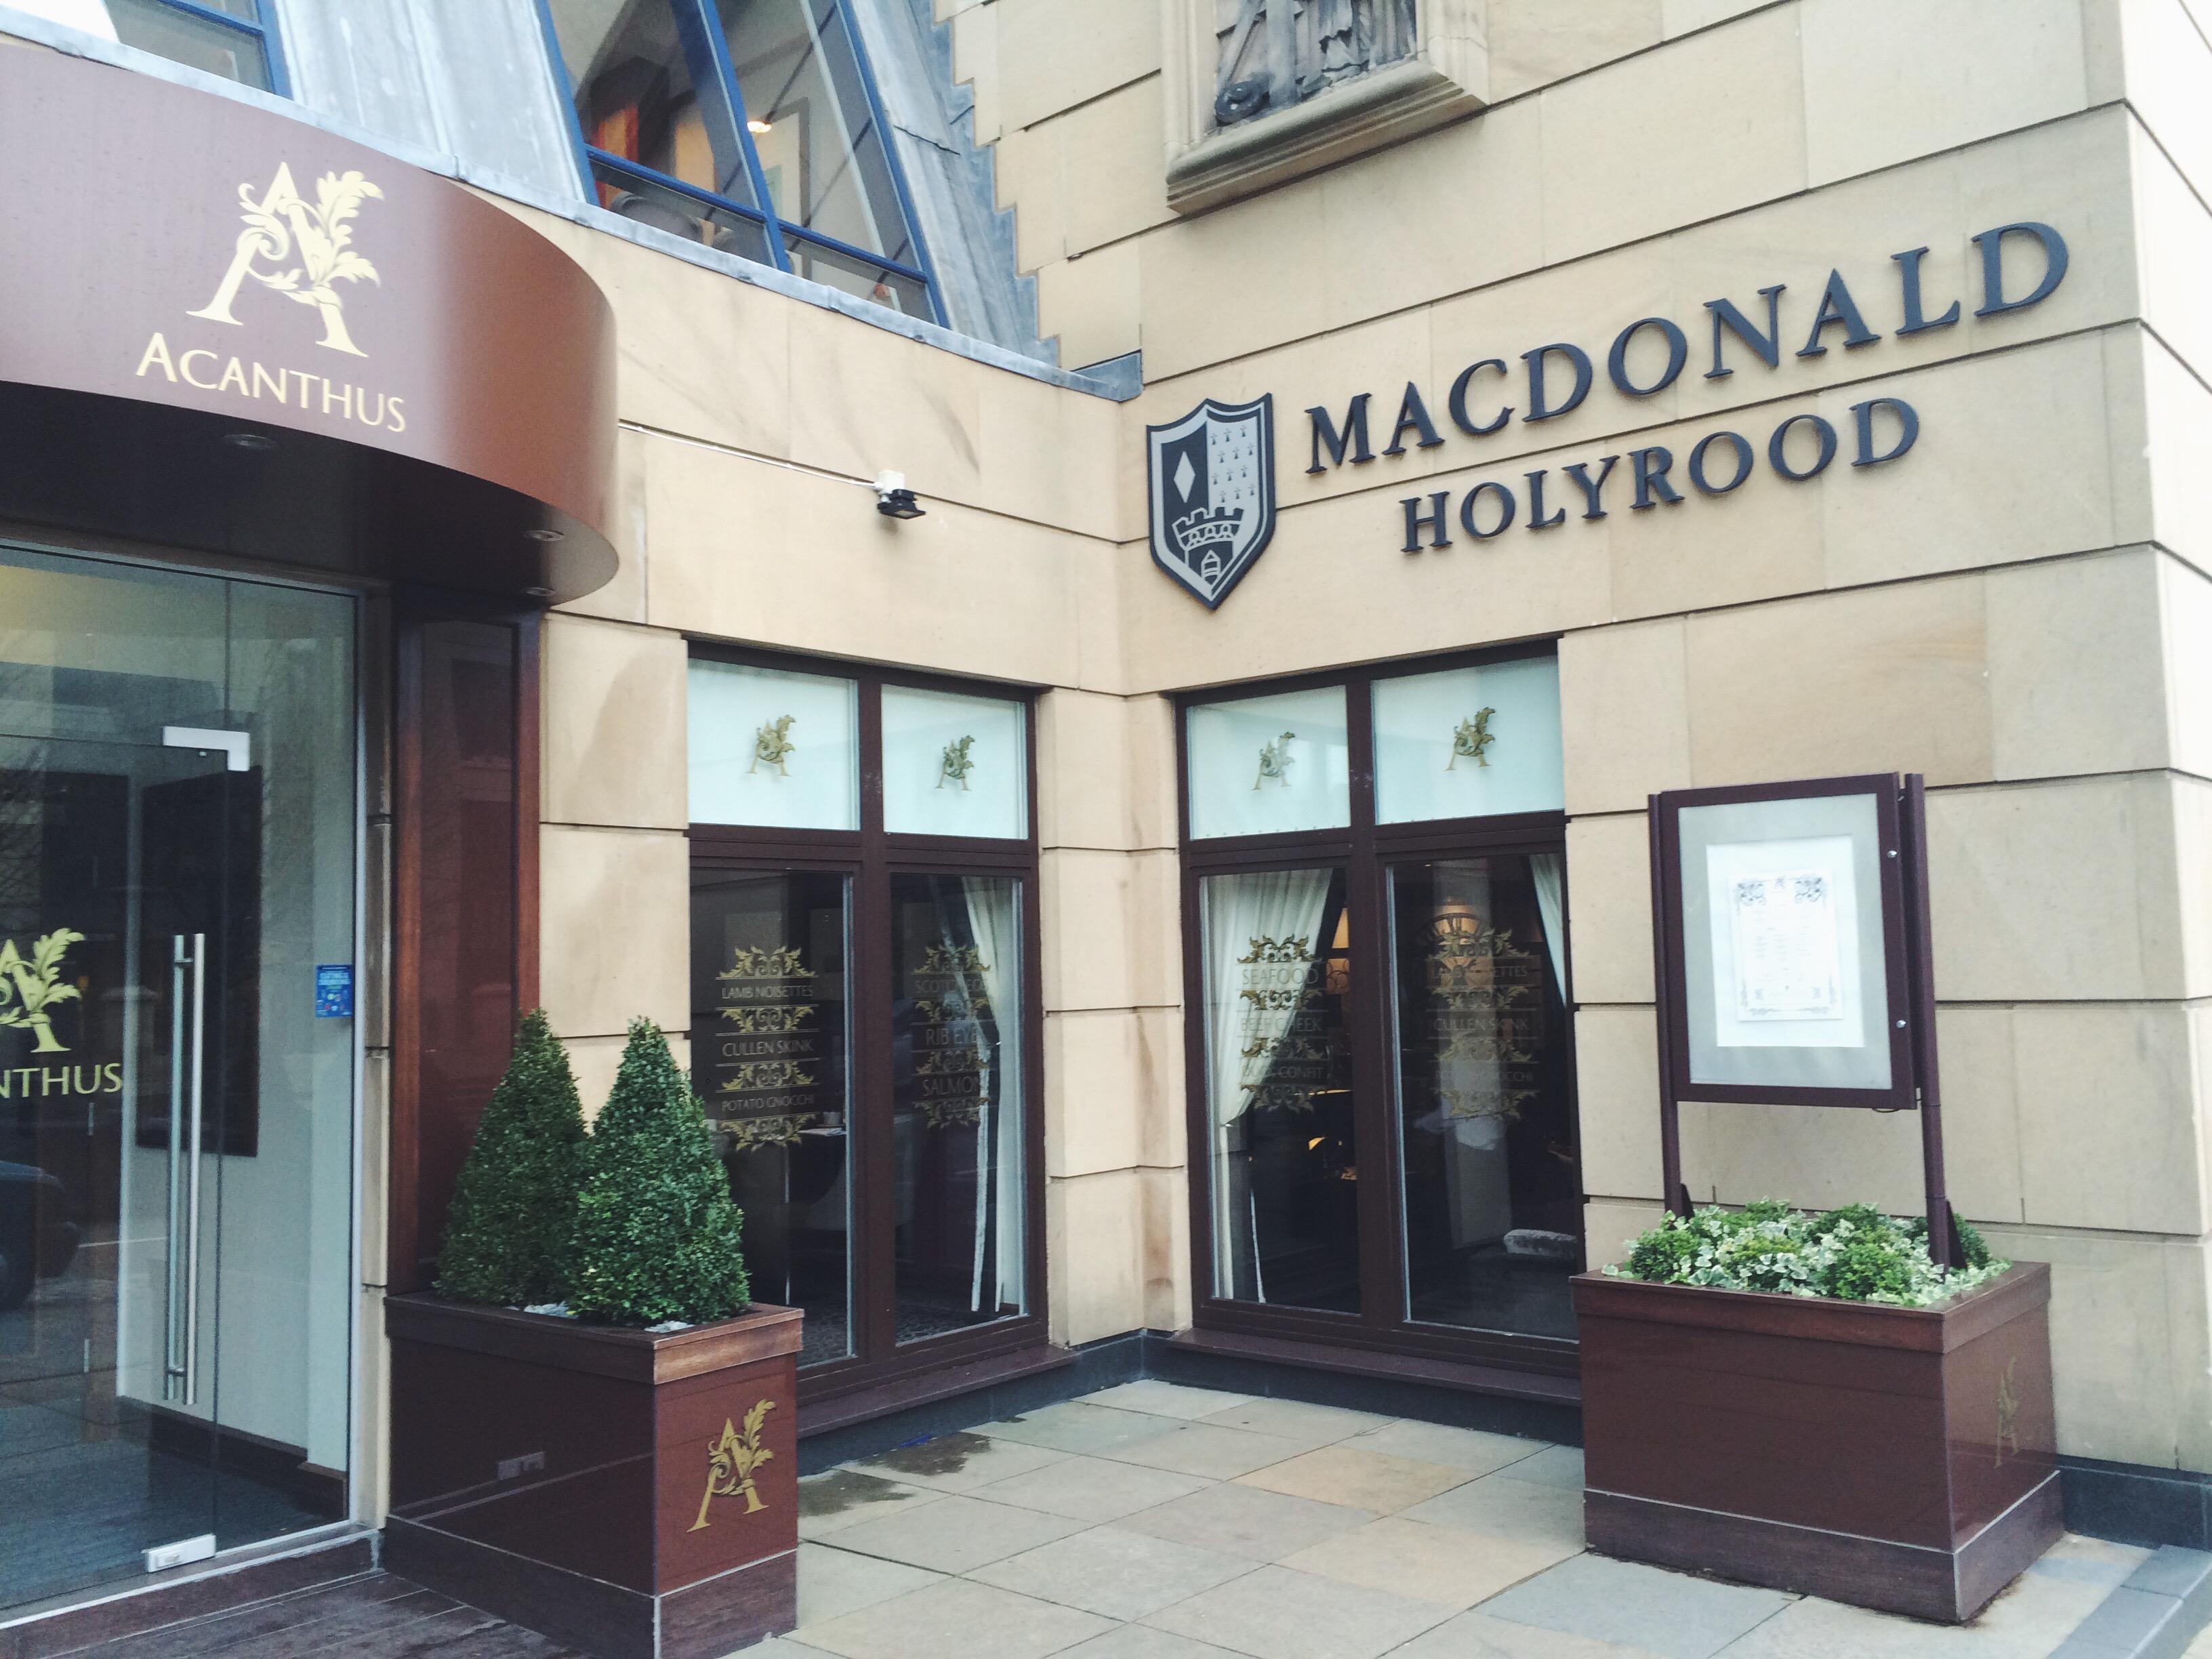 Checking into the Macdonald Holyrood Hotel, Edinburgh